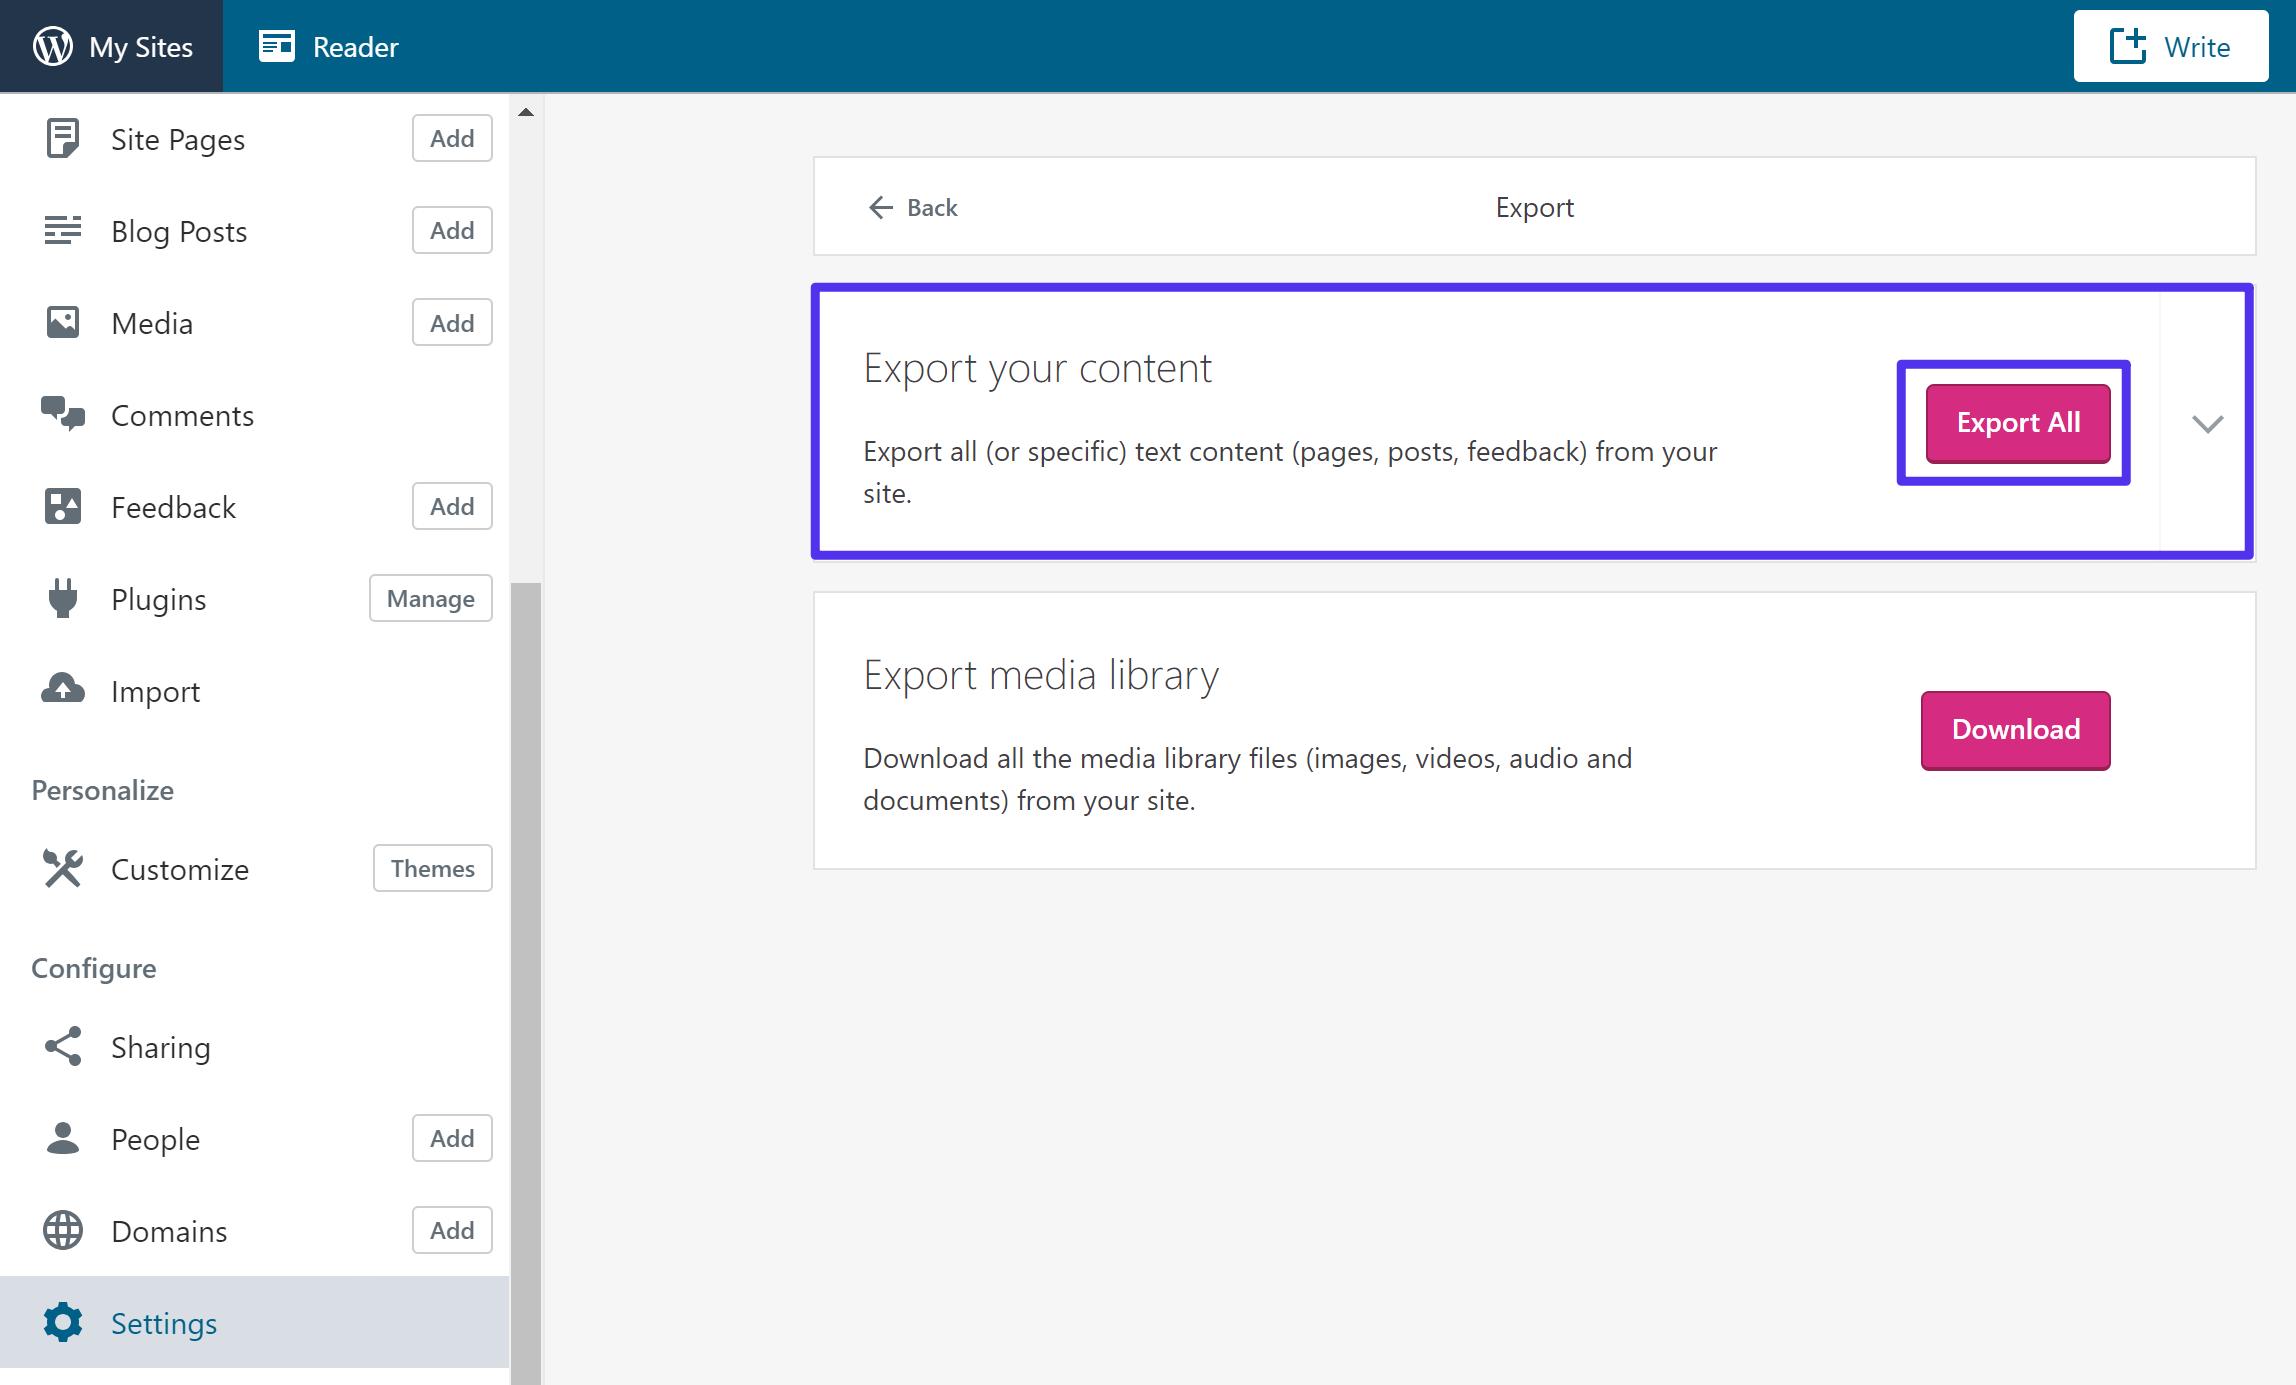 Exporter votre contenu depuis WordPress.com